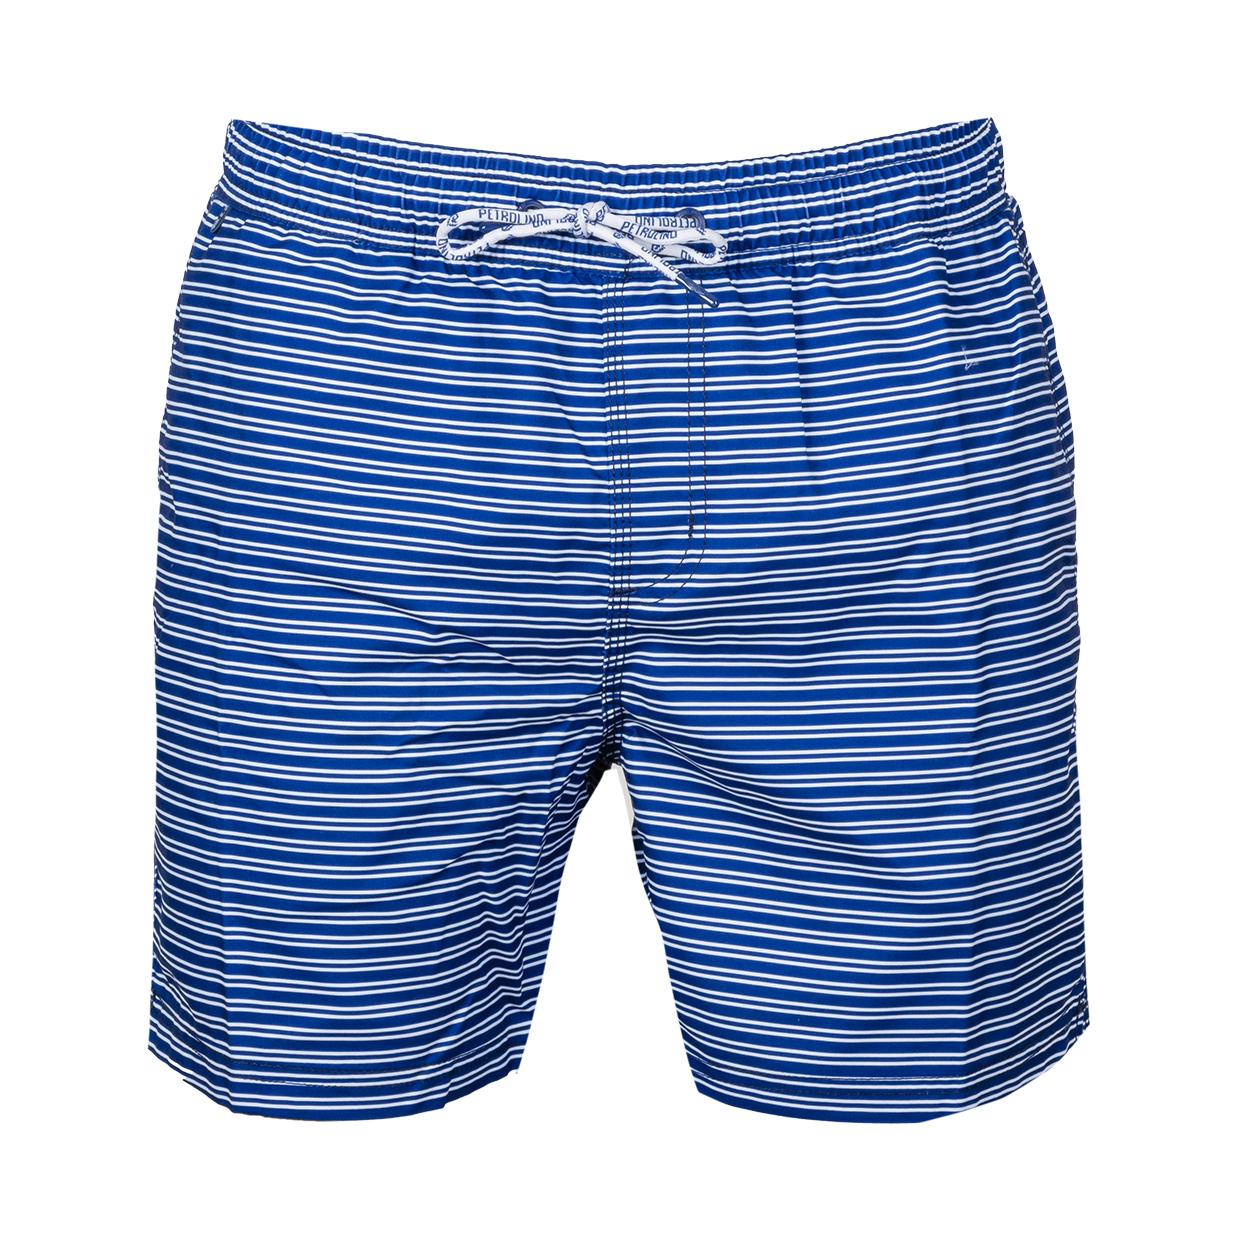 Short de bain Petrol Industries bleu à rayures horizontales blanches